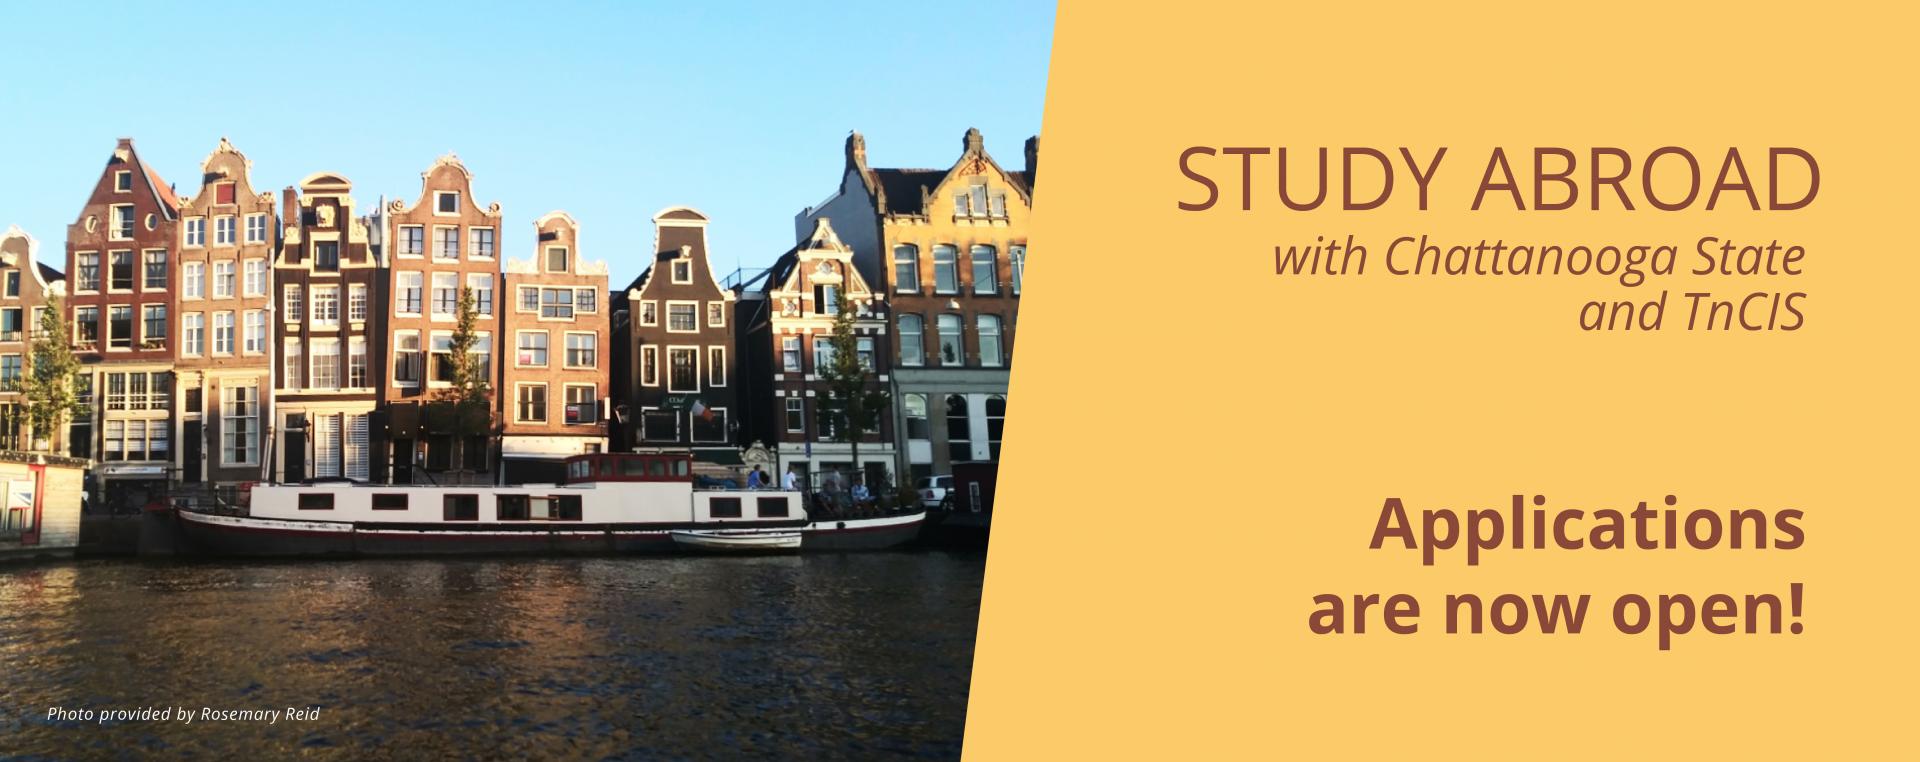 study abroad slide